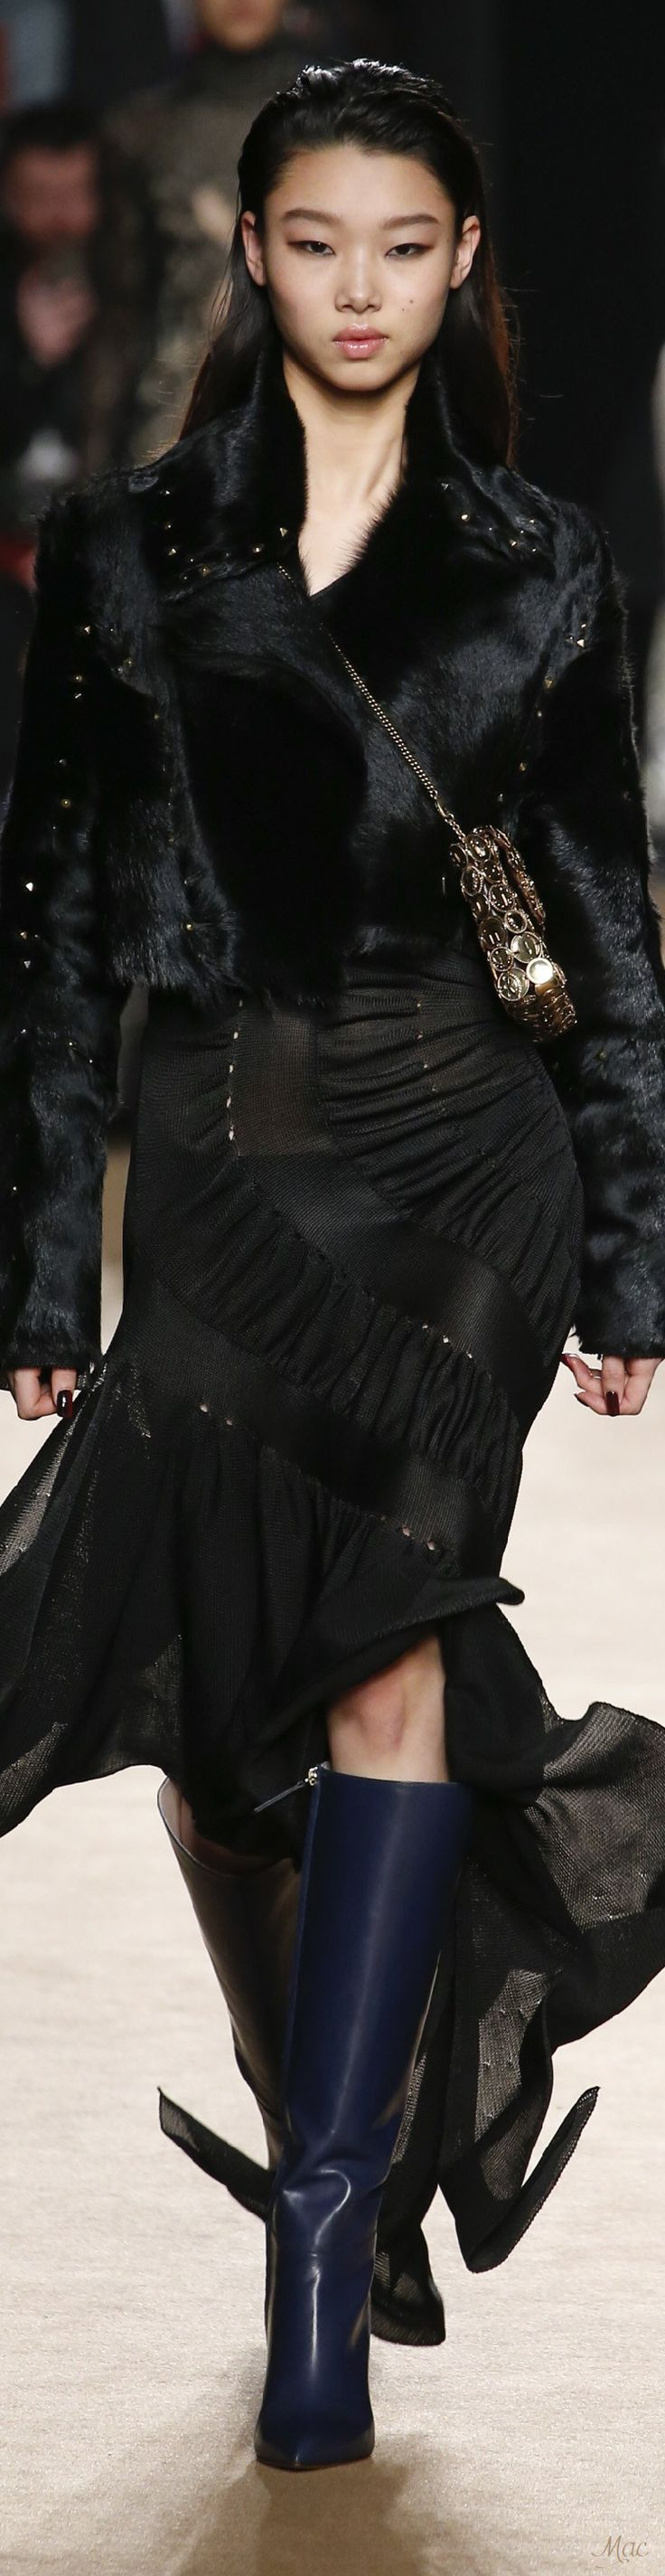 a053a29a0f715709f2e5353b8e3b46d9 Roberto Cavalli Couture  : Automne 2018 Roberto Cavalli, RTW